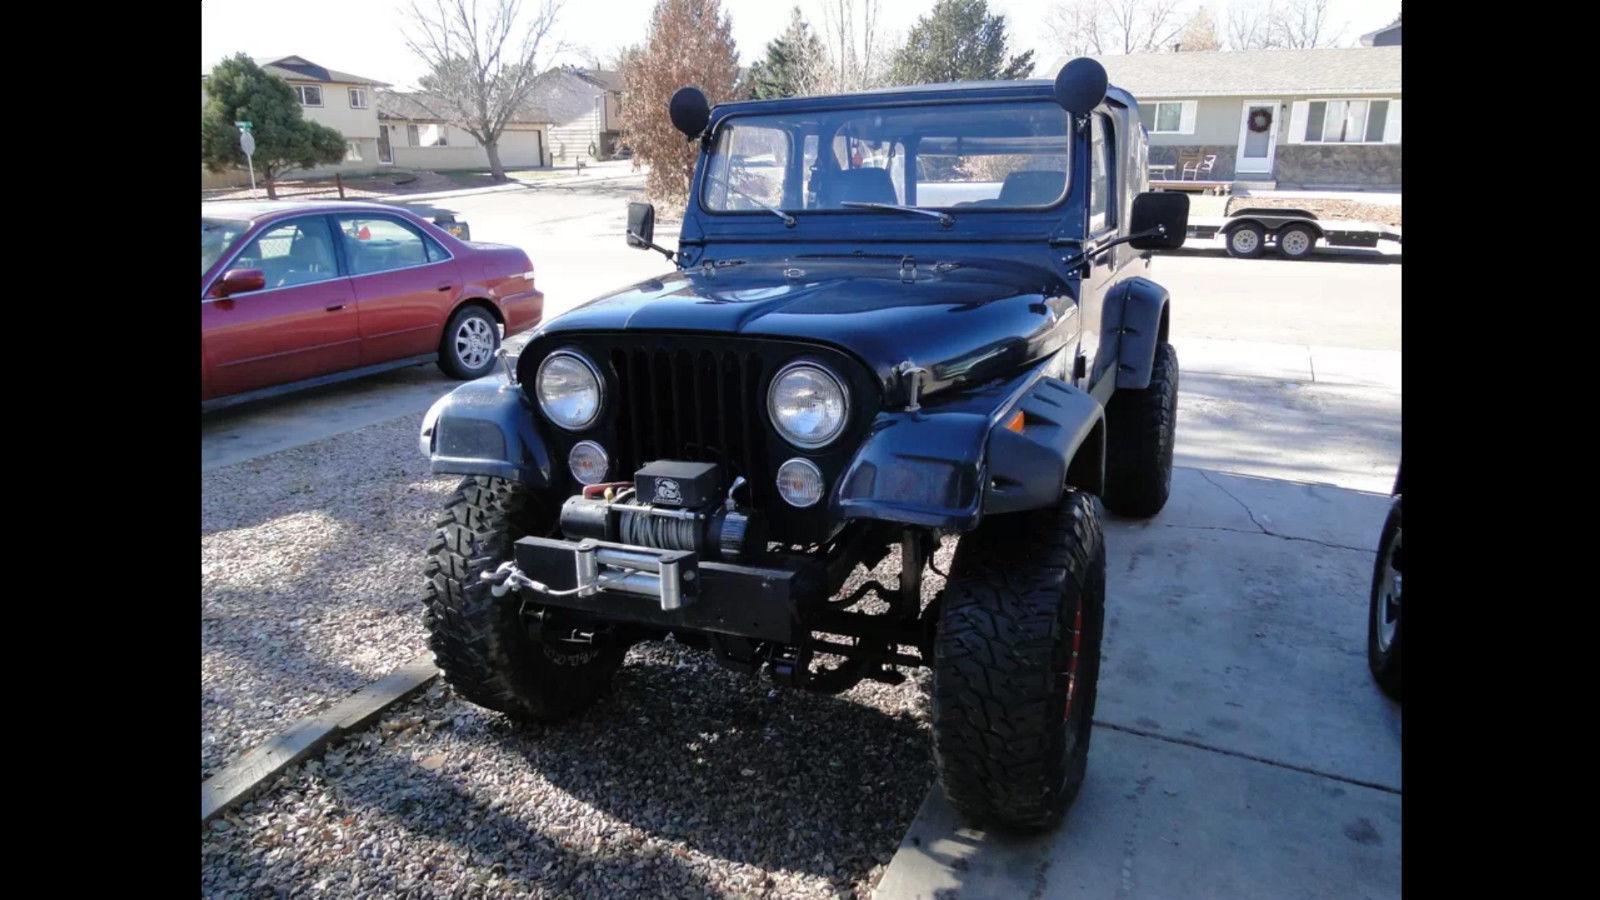 jeep scrambler cj8 arb dana 44 v8 rock crawler custom